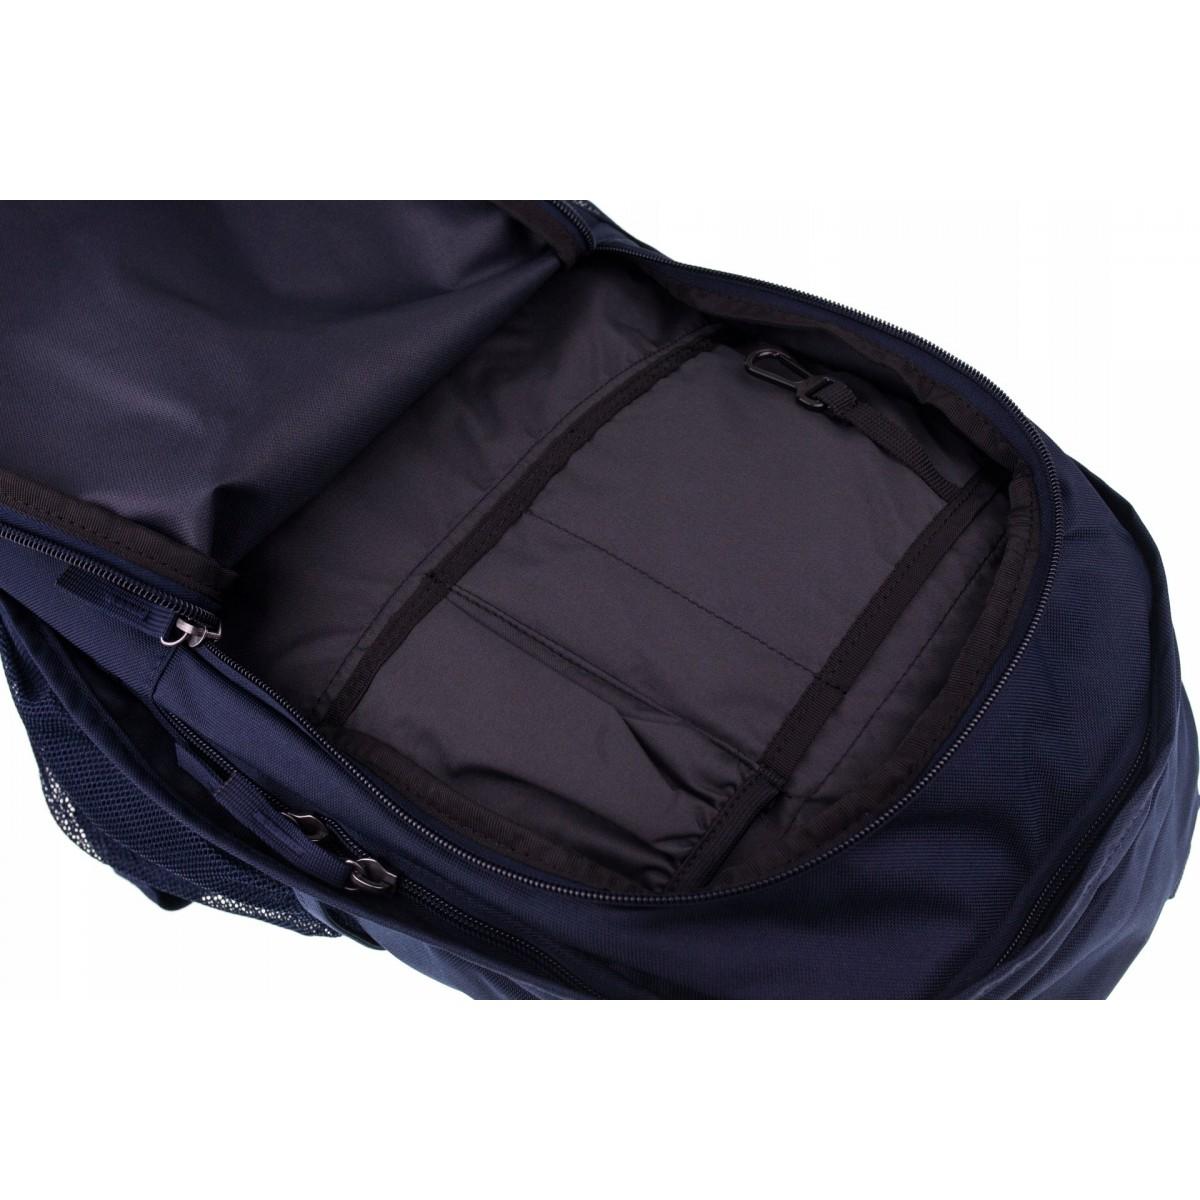 59a0543655d5d ... Plecak Nike Sw Hayward F Ba5217-451 ...